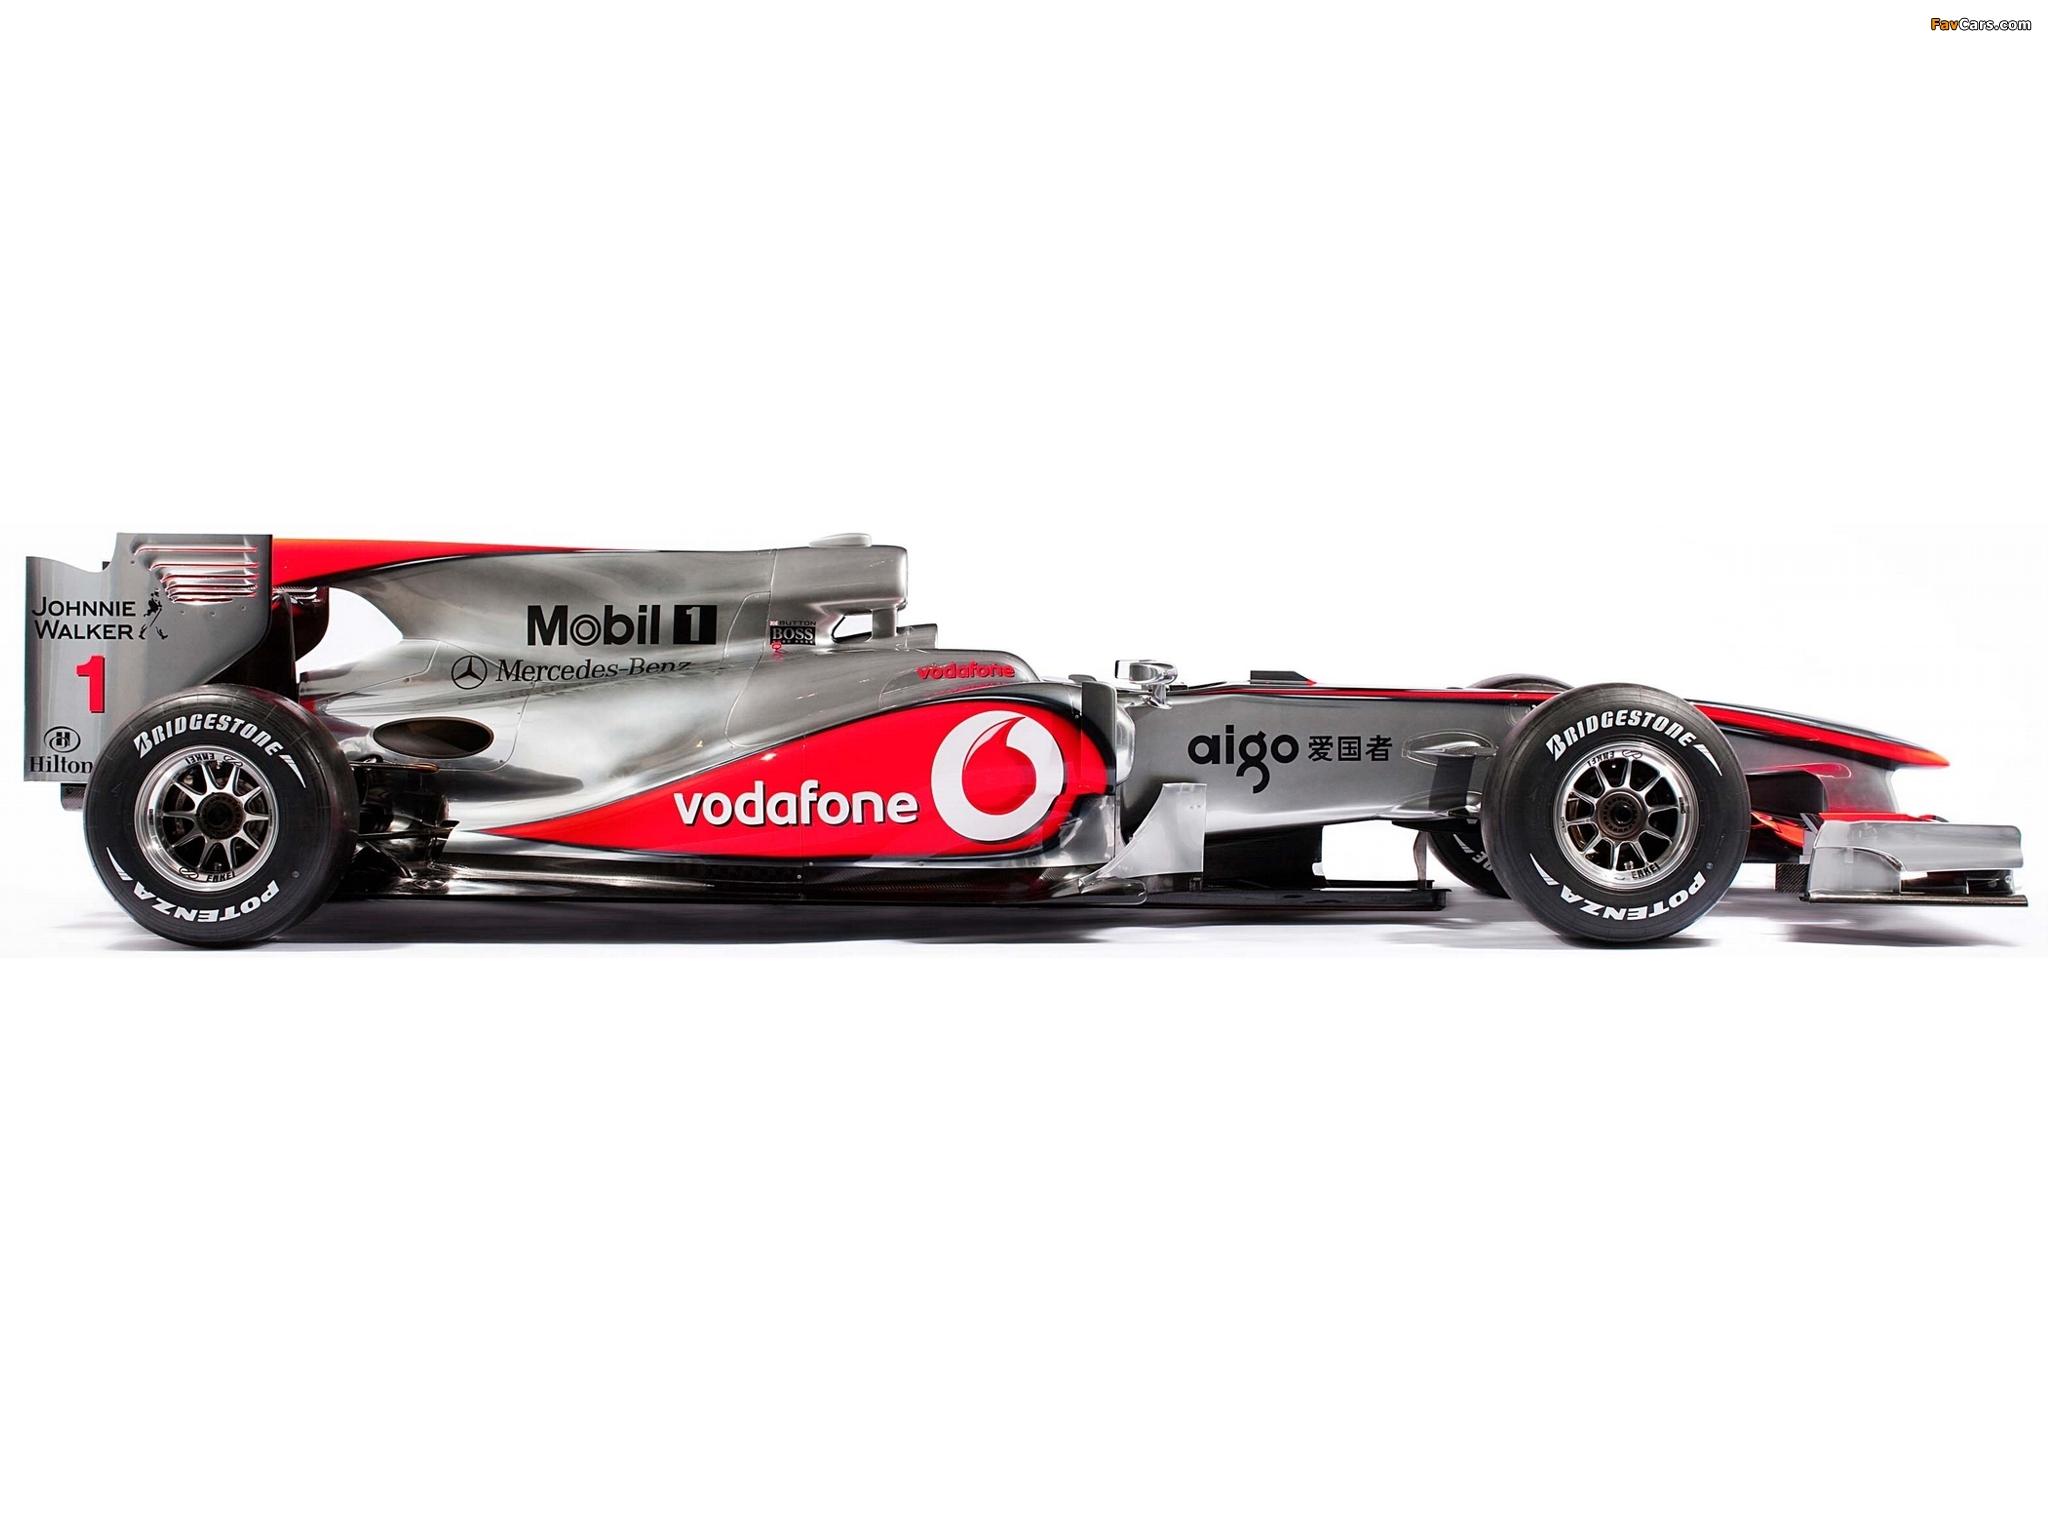 Mclaren mercedes benz mp4 25 2010 pictures 2048x1536 for Mercedes benz formula 1